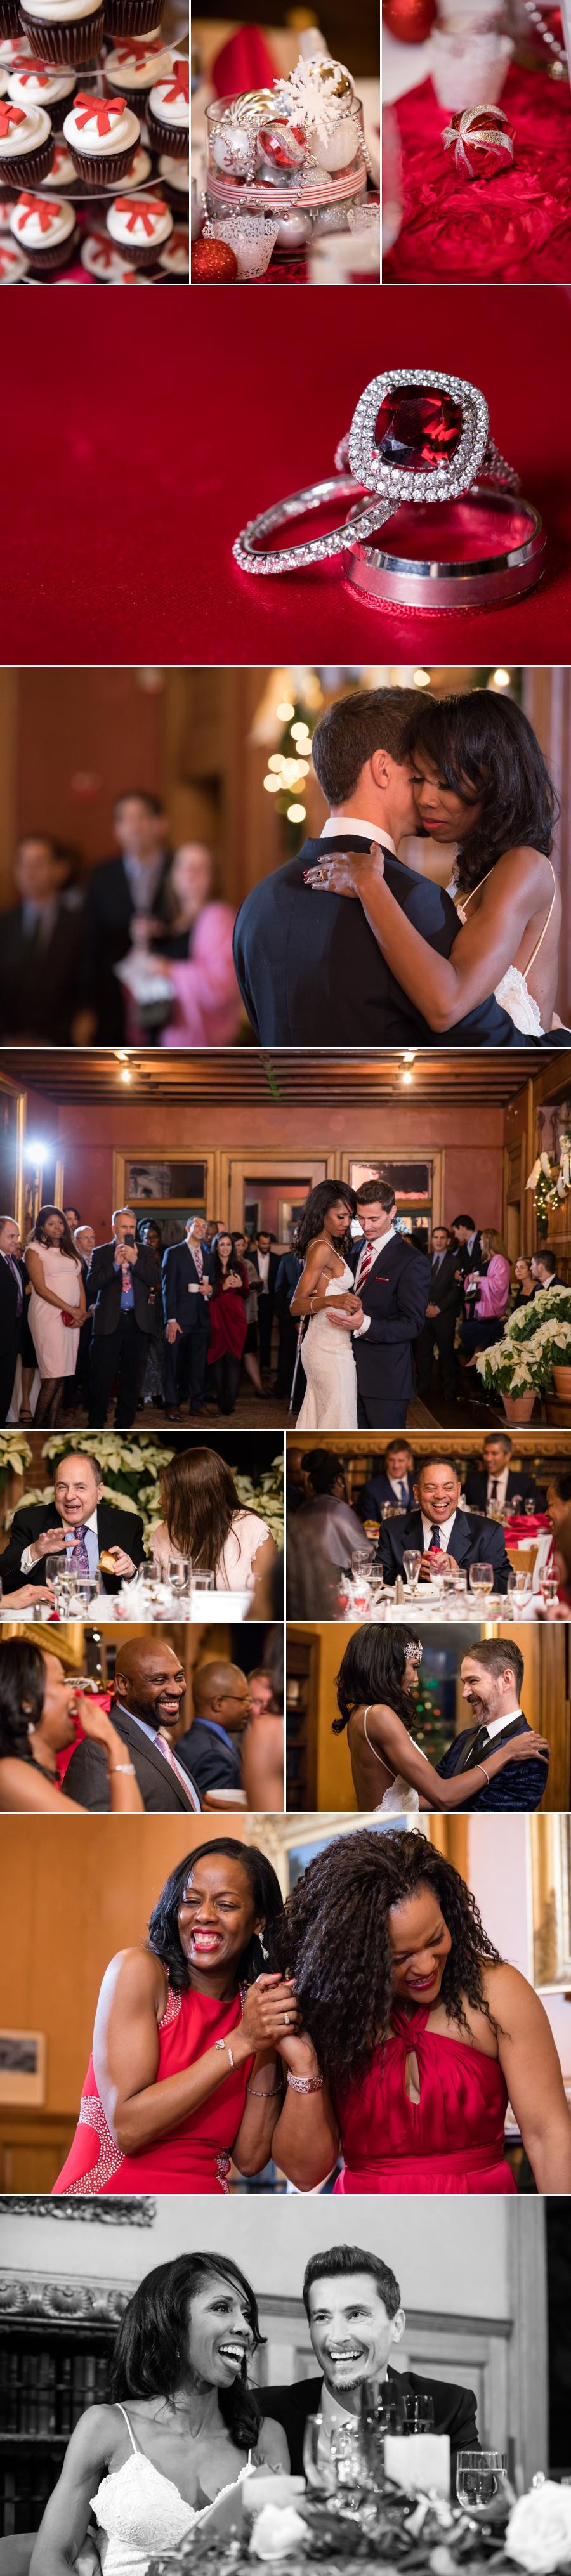 wedding reception collage